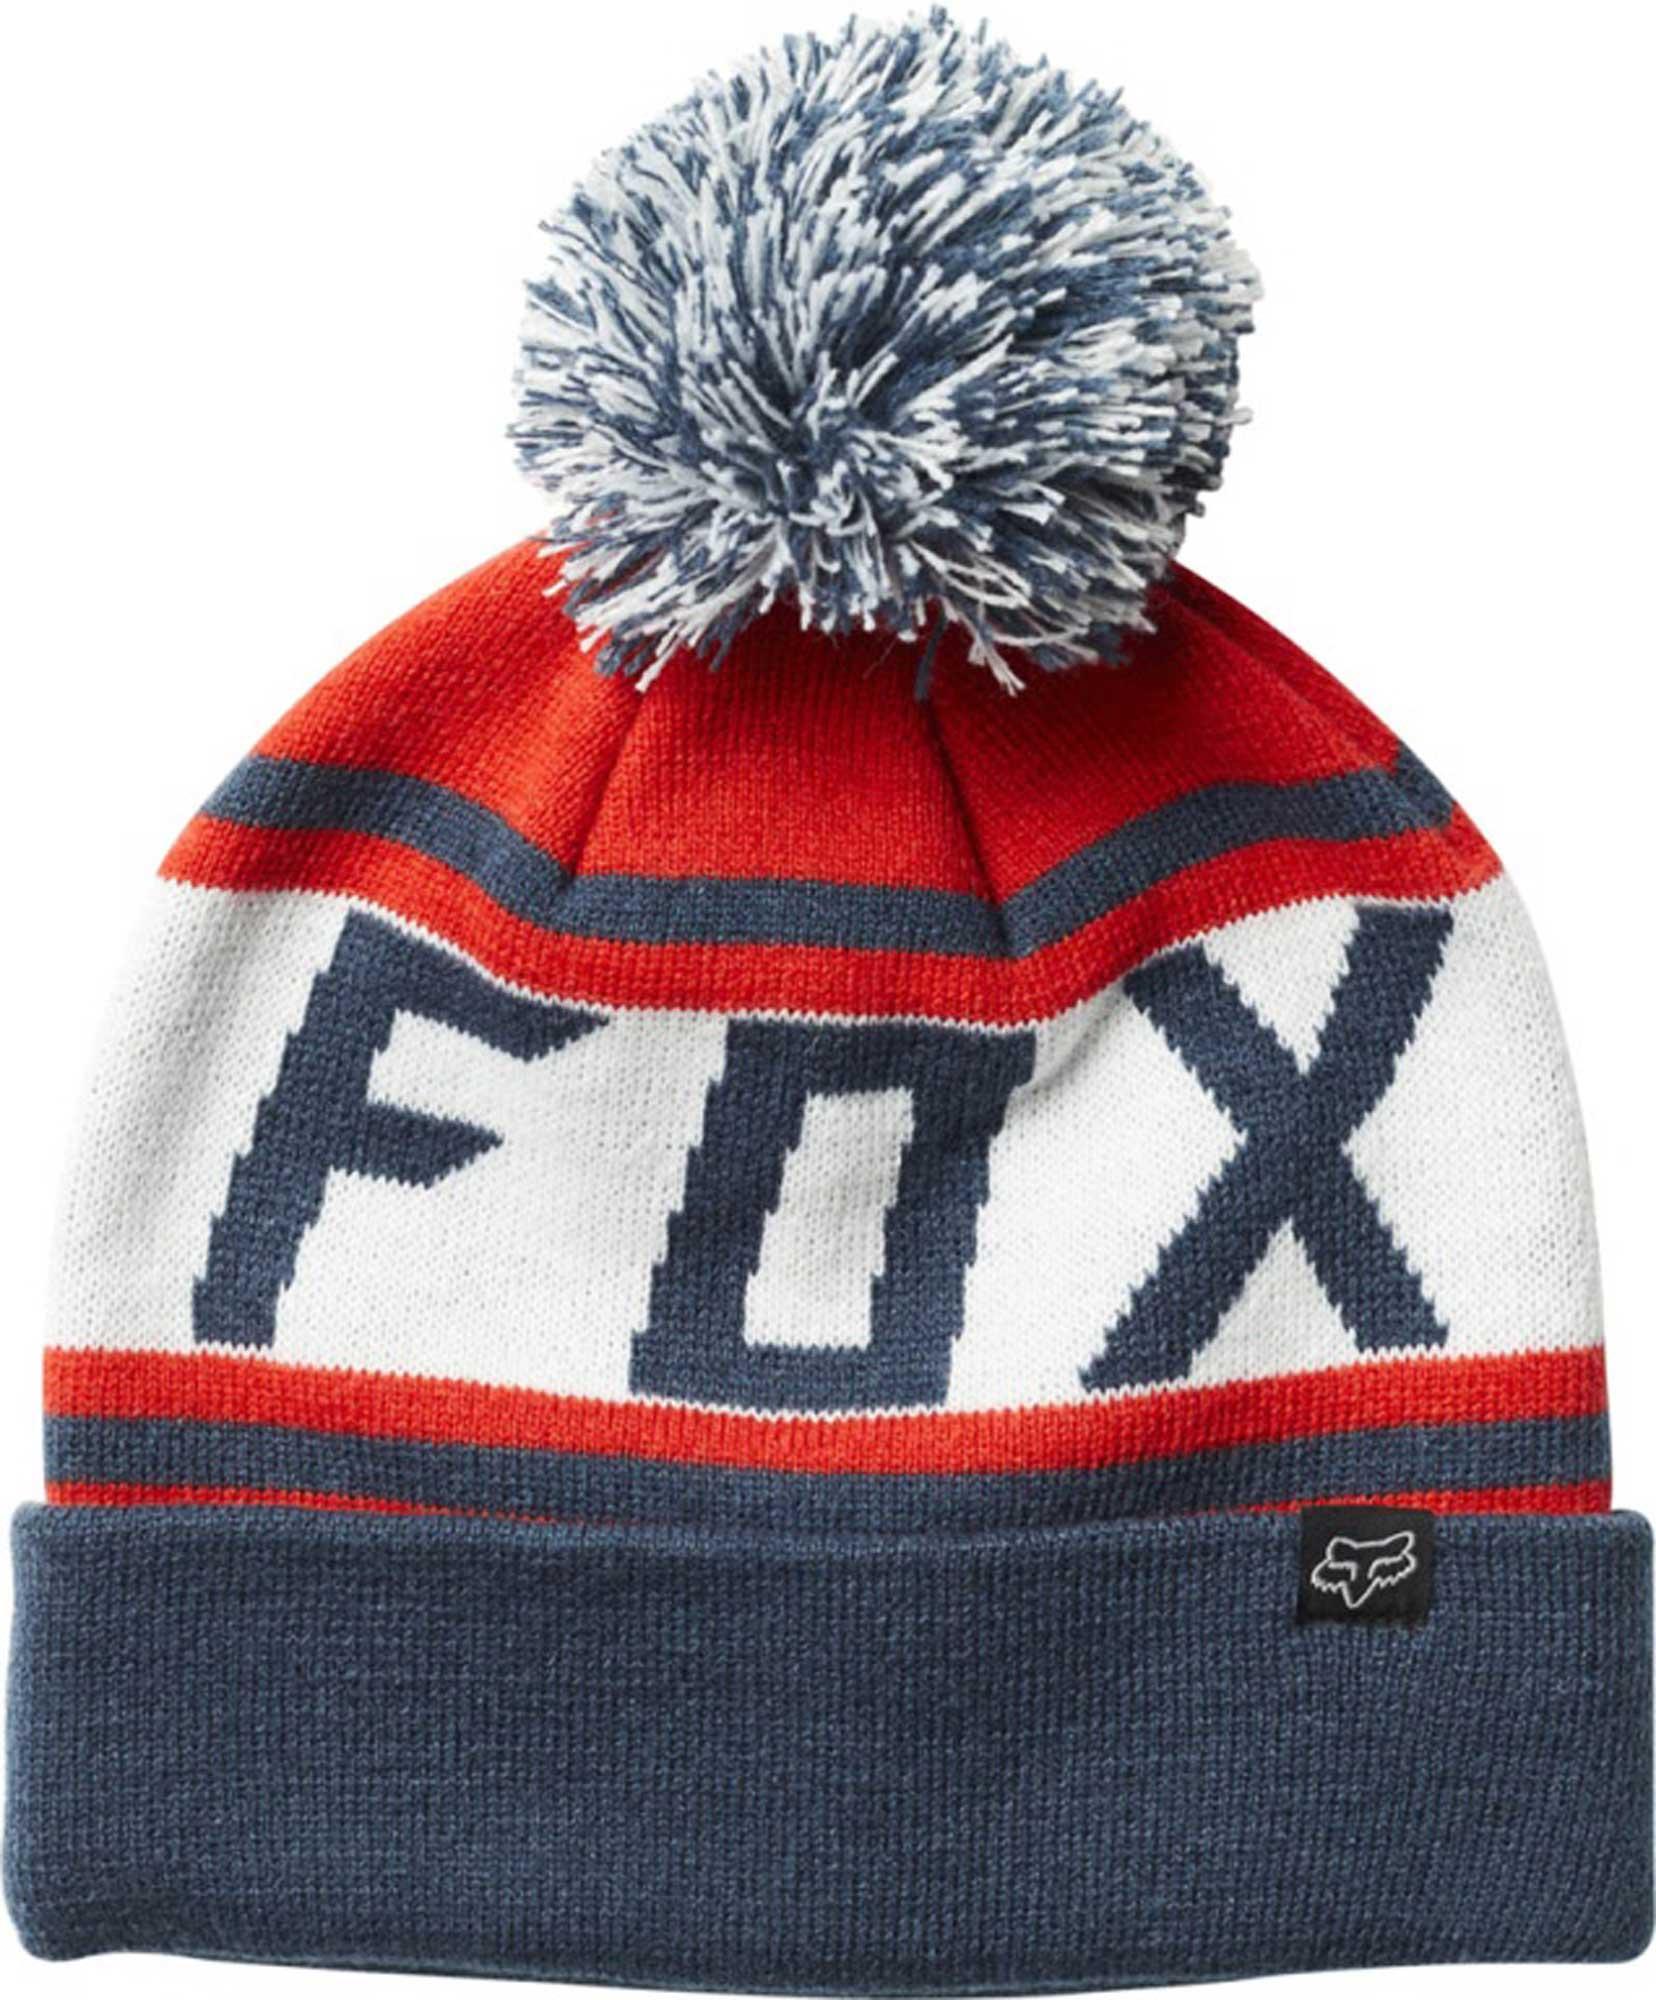 130f6cb3f Fox Sports & Clothing THROWBACK BEANIE. Pánska čiapka. Pánska čiapka. Pánska  čiapka. 1